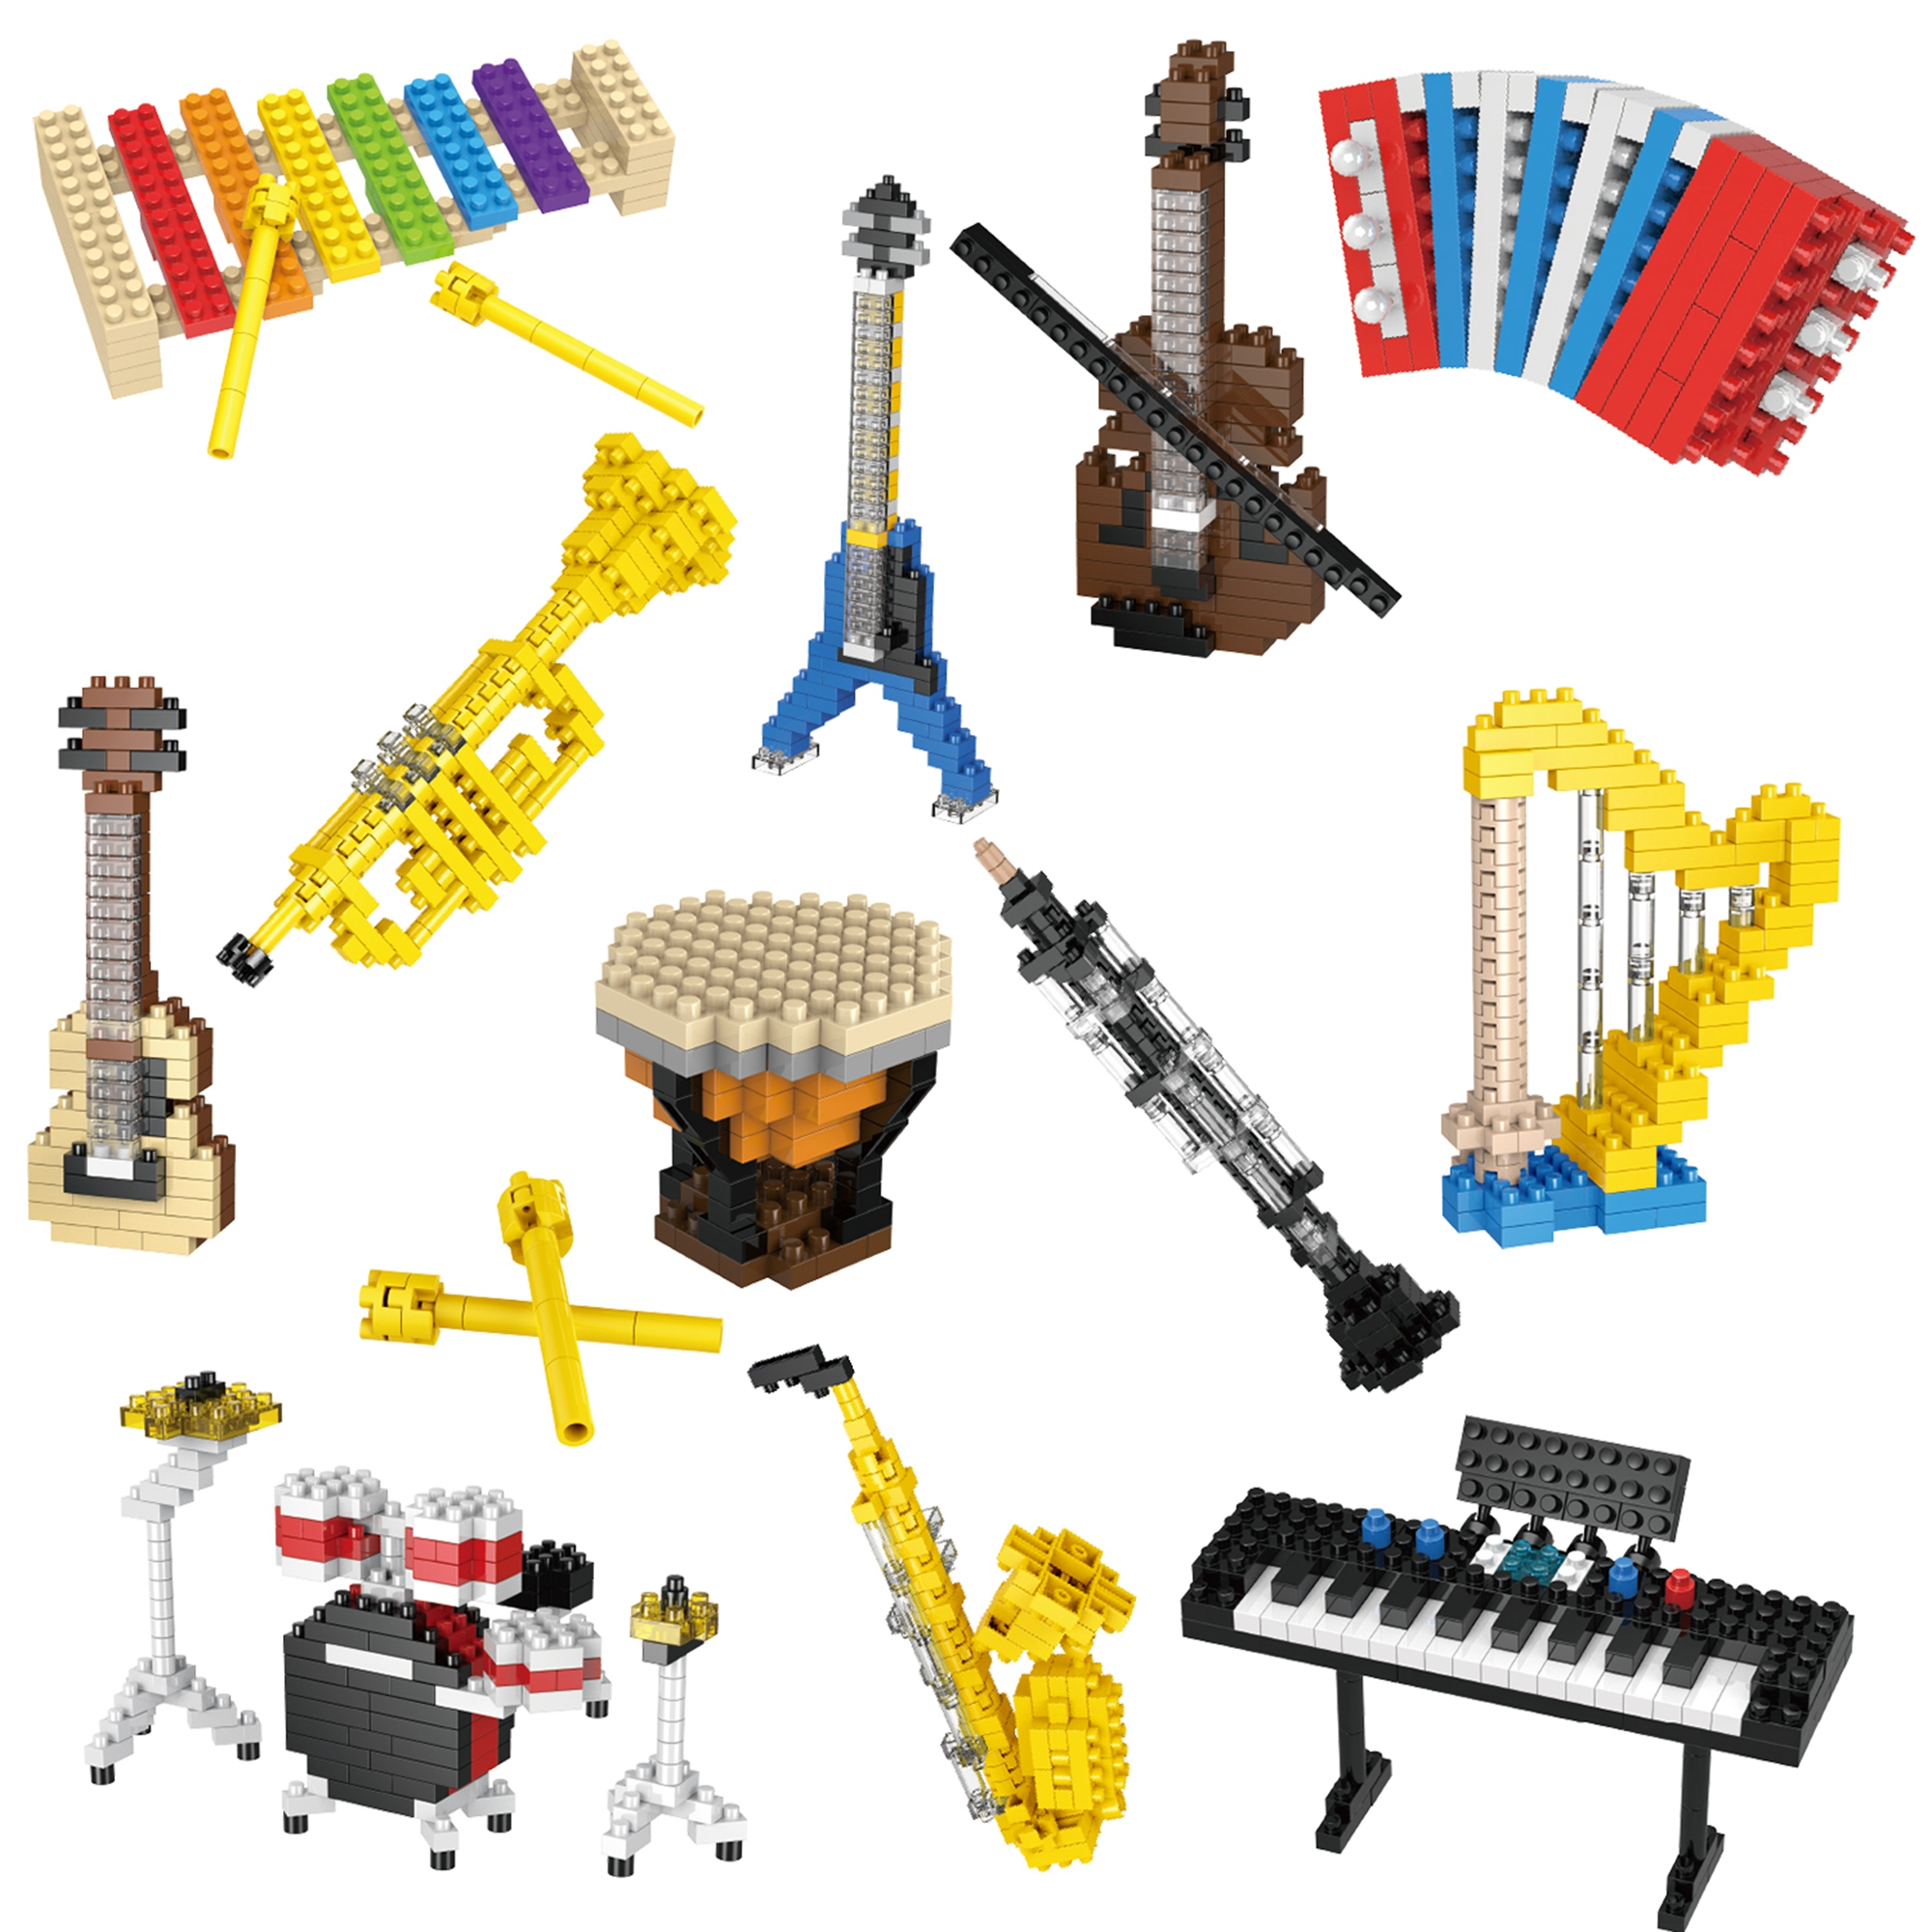 Party Favors For Kids Mini Musical Instrument Building Blocks Sets For Goodie Bags Prizes Easter Basket Stuffers 12 Boxes F 506 Walmart Com Walmart Com